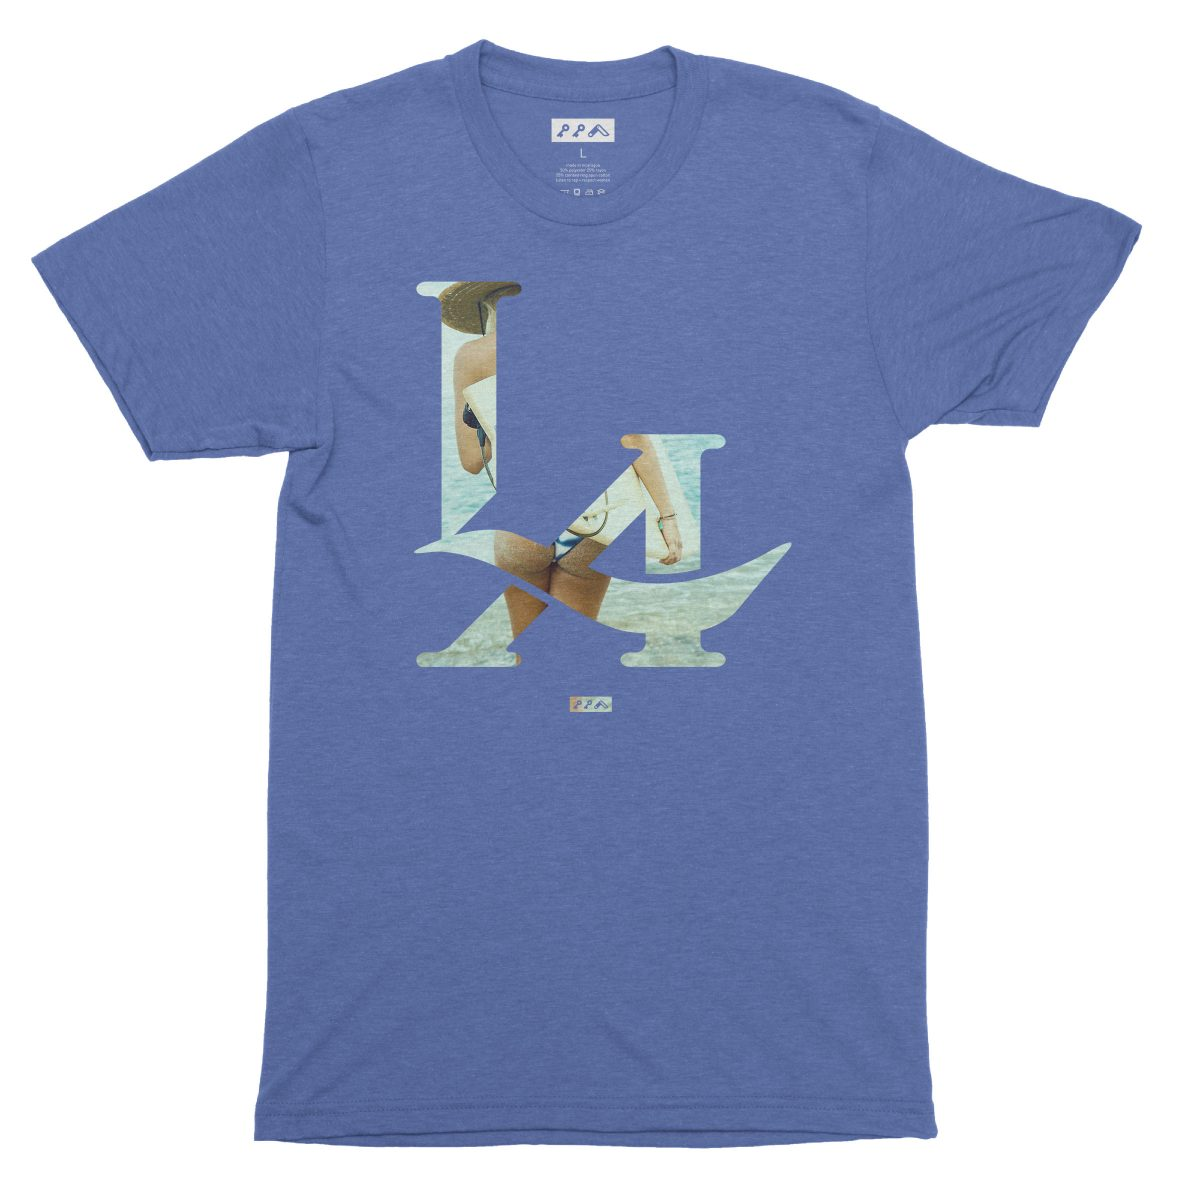 LA logo los angeles surfs up bikini beach butt t-shirt in blue by kikicutt